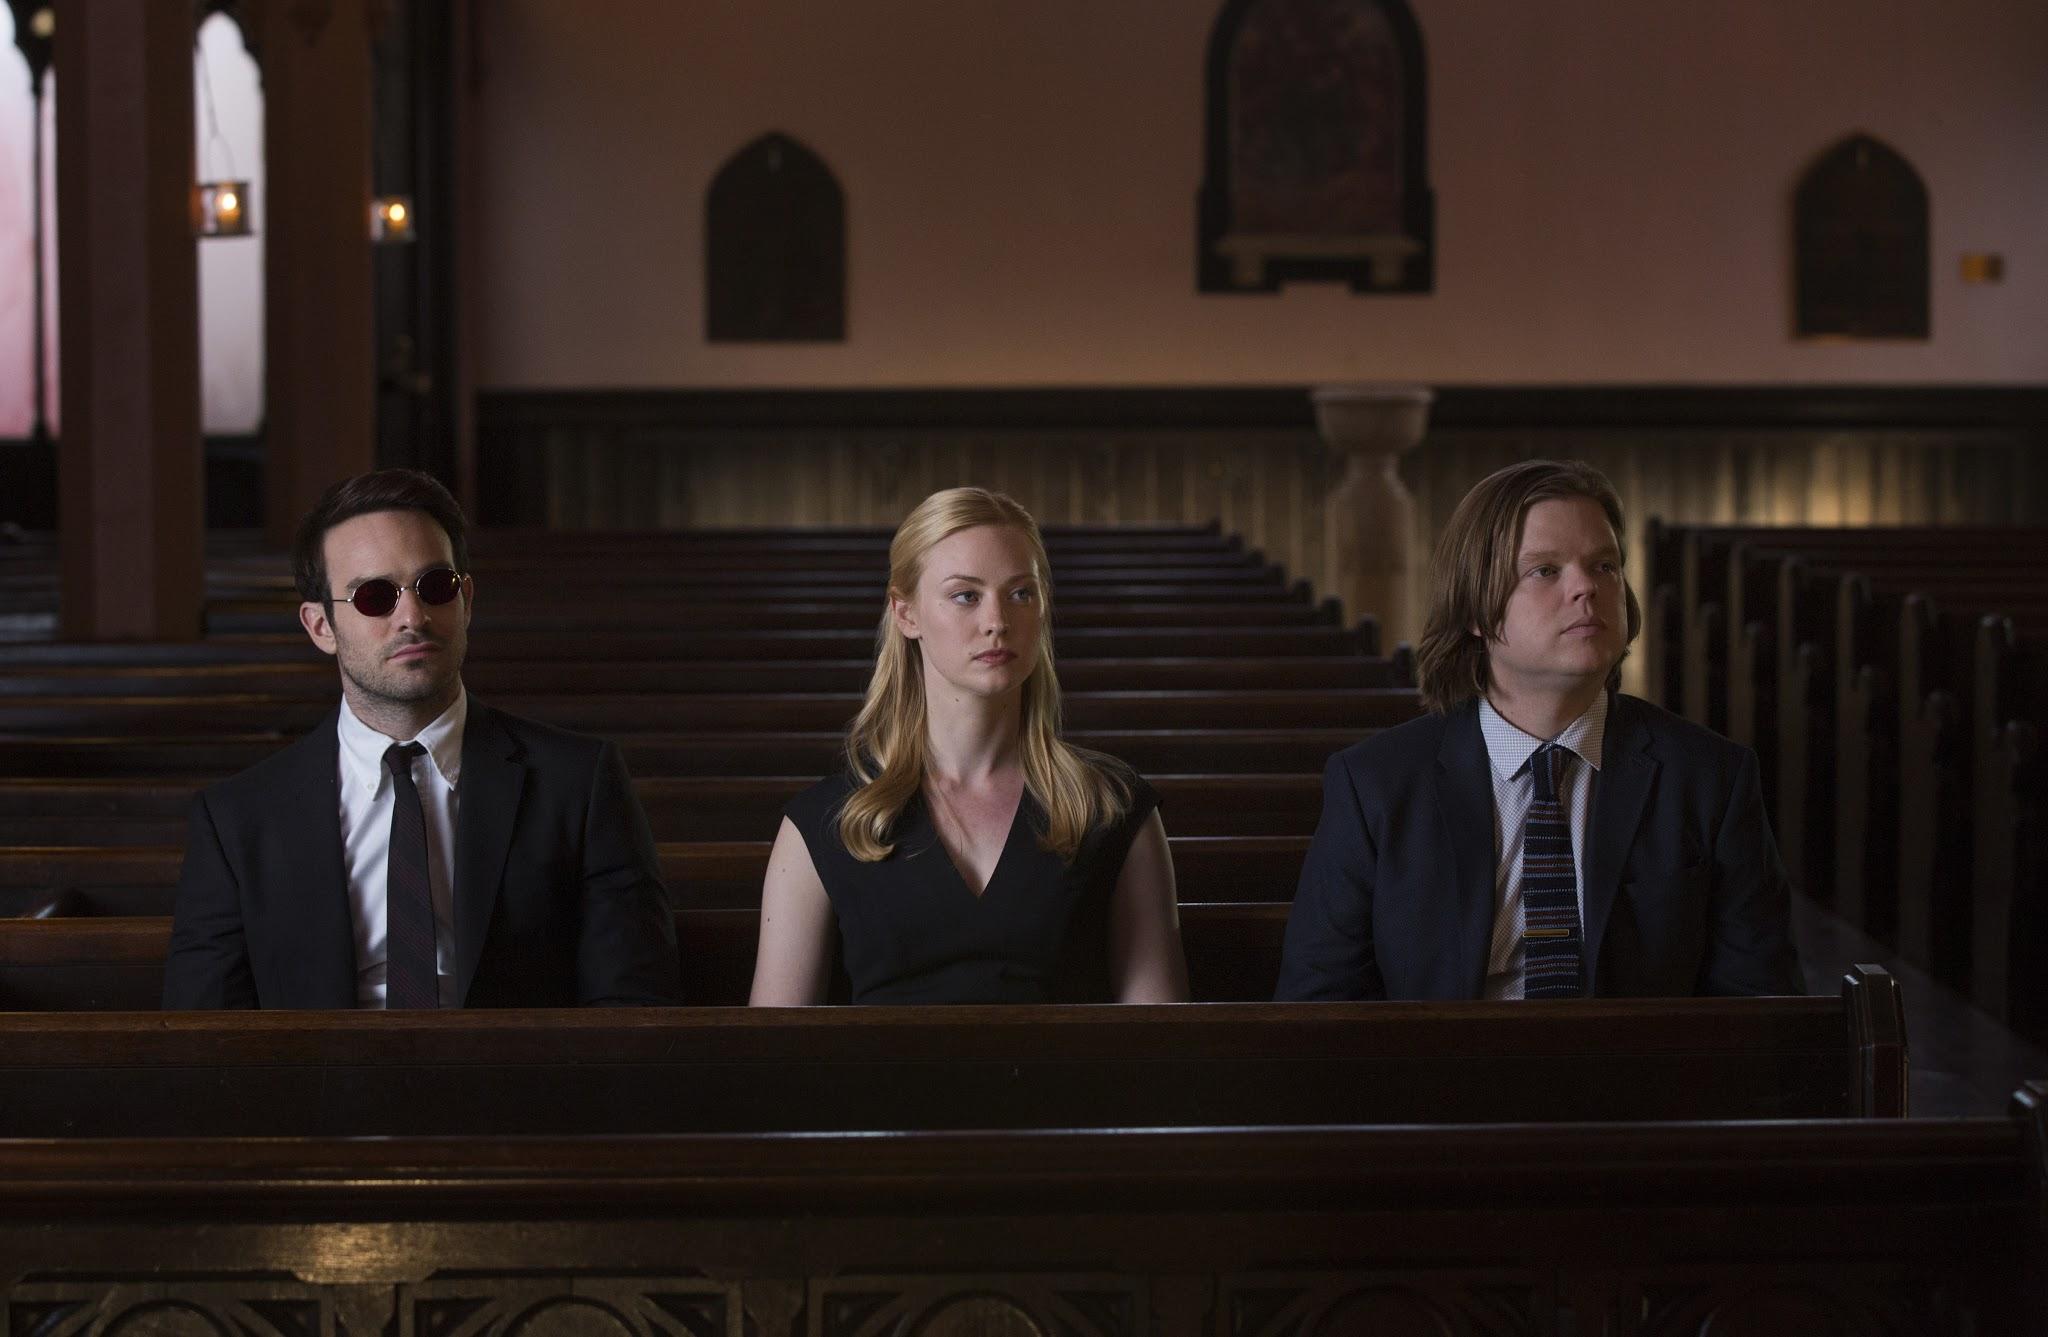 Daredevil Season 2 First Look: Elektra Looks Classy For Netflix's Storyline #35397